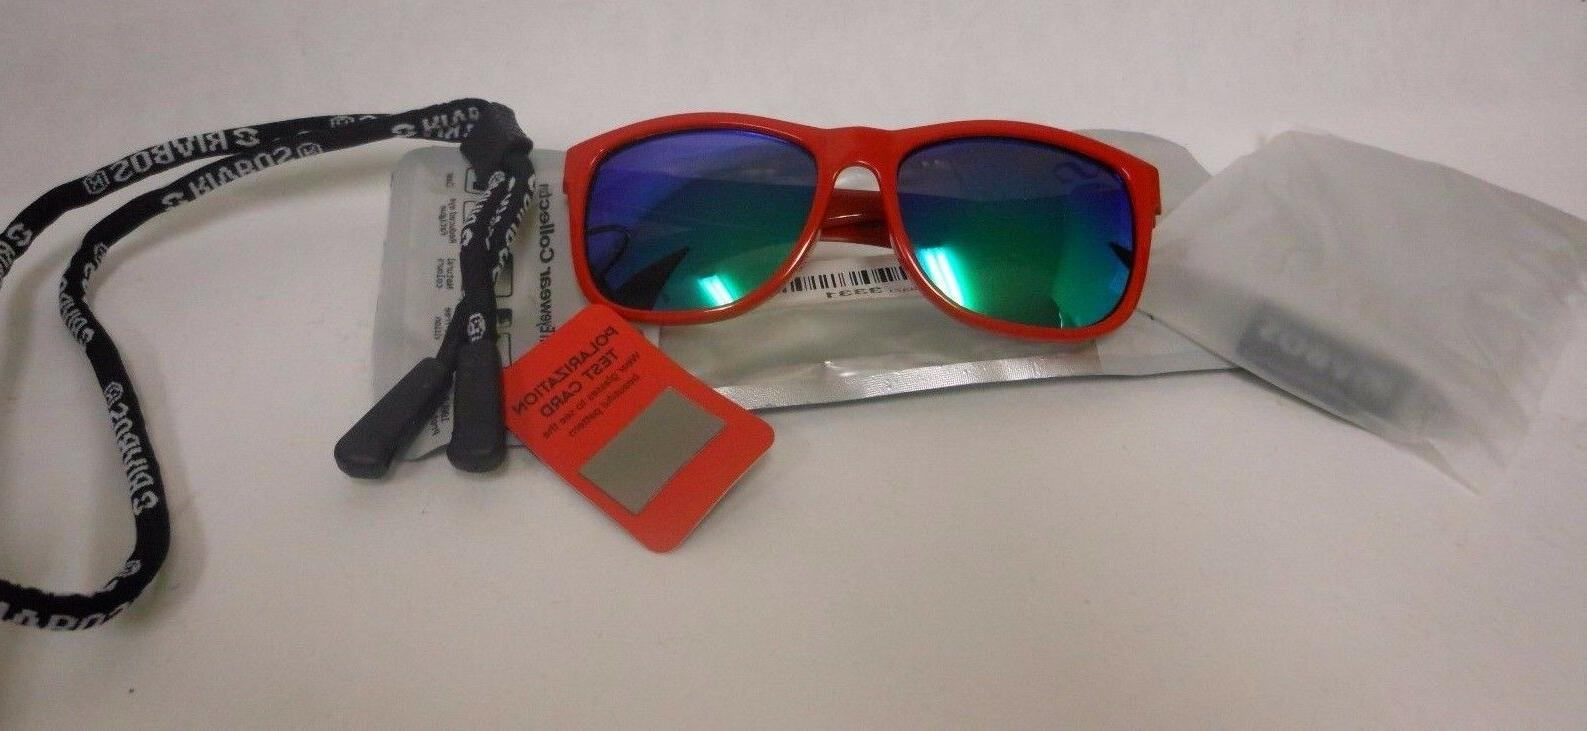 805 polarized sunglasses